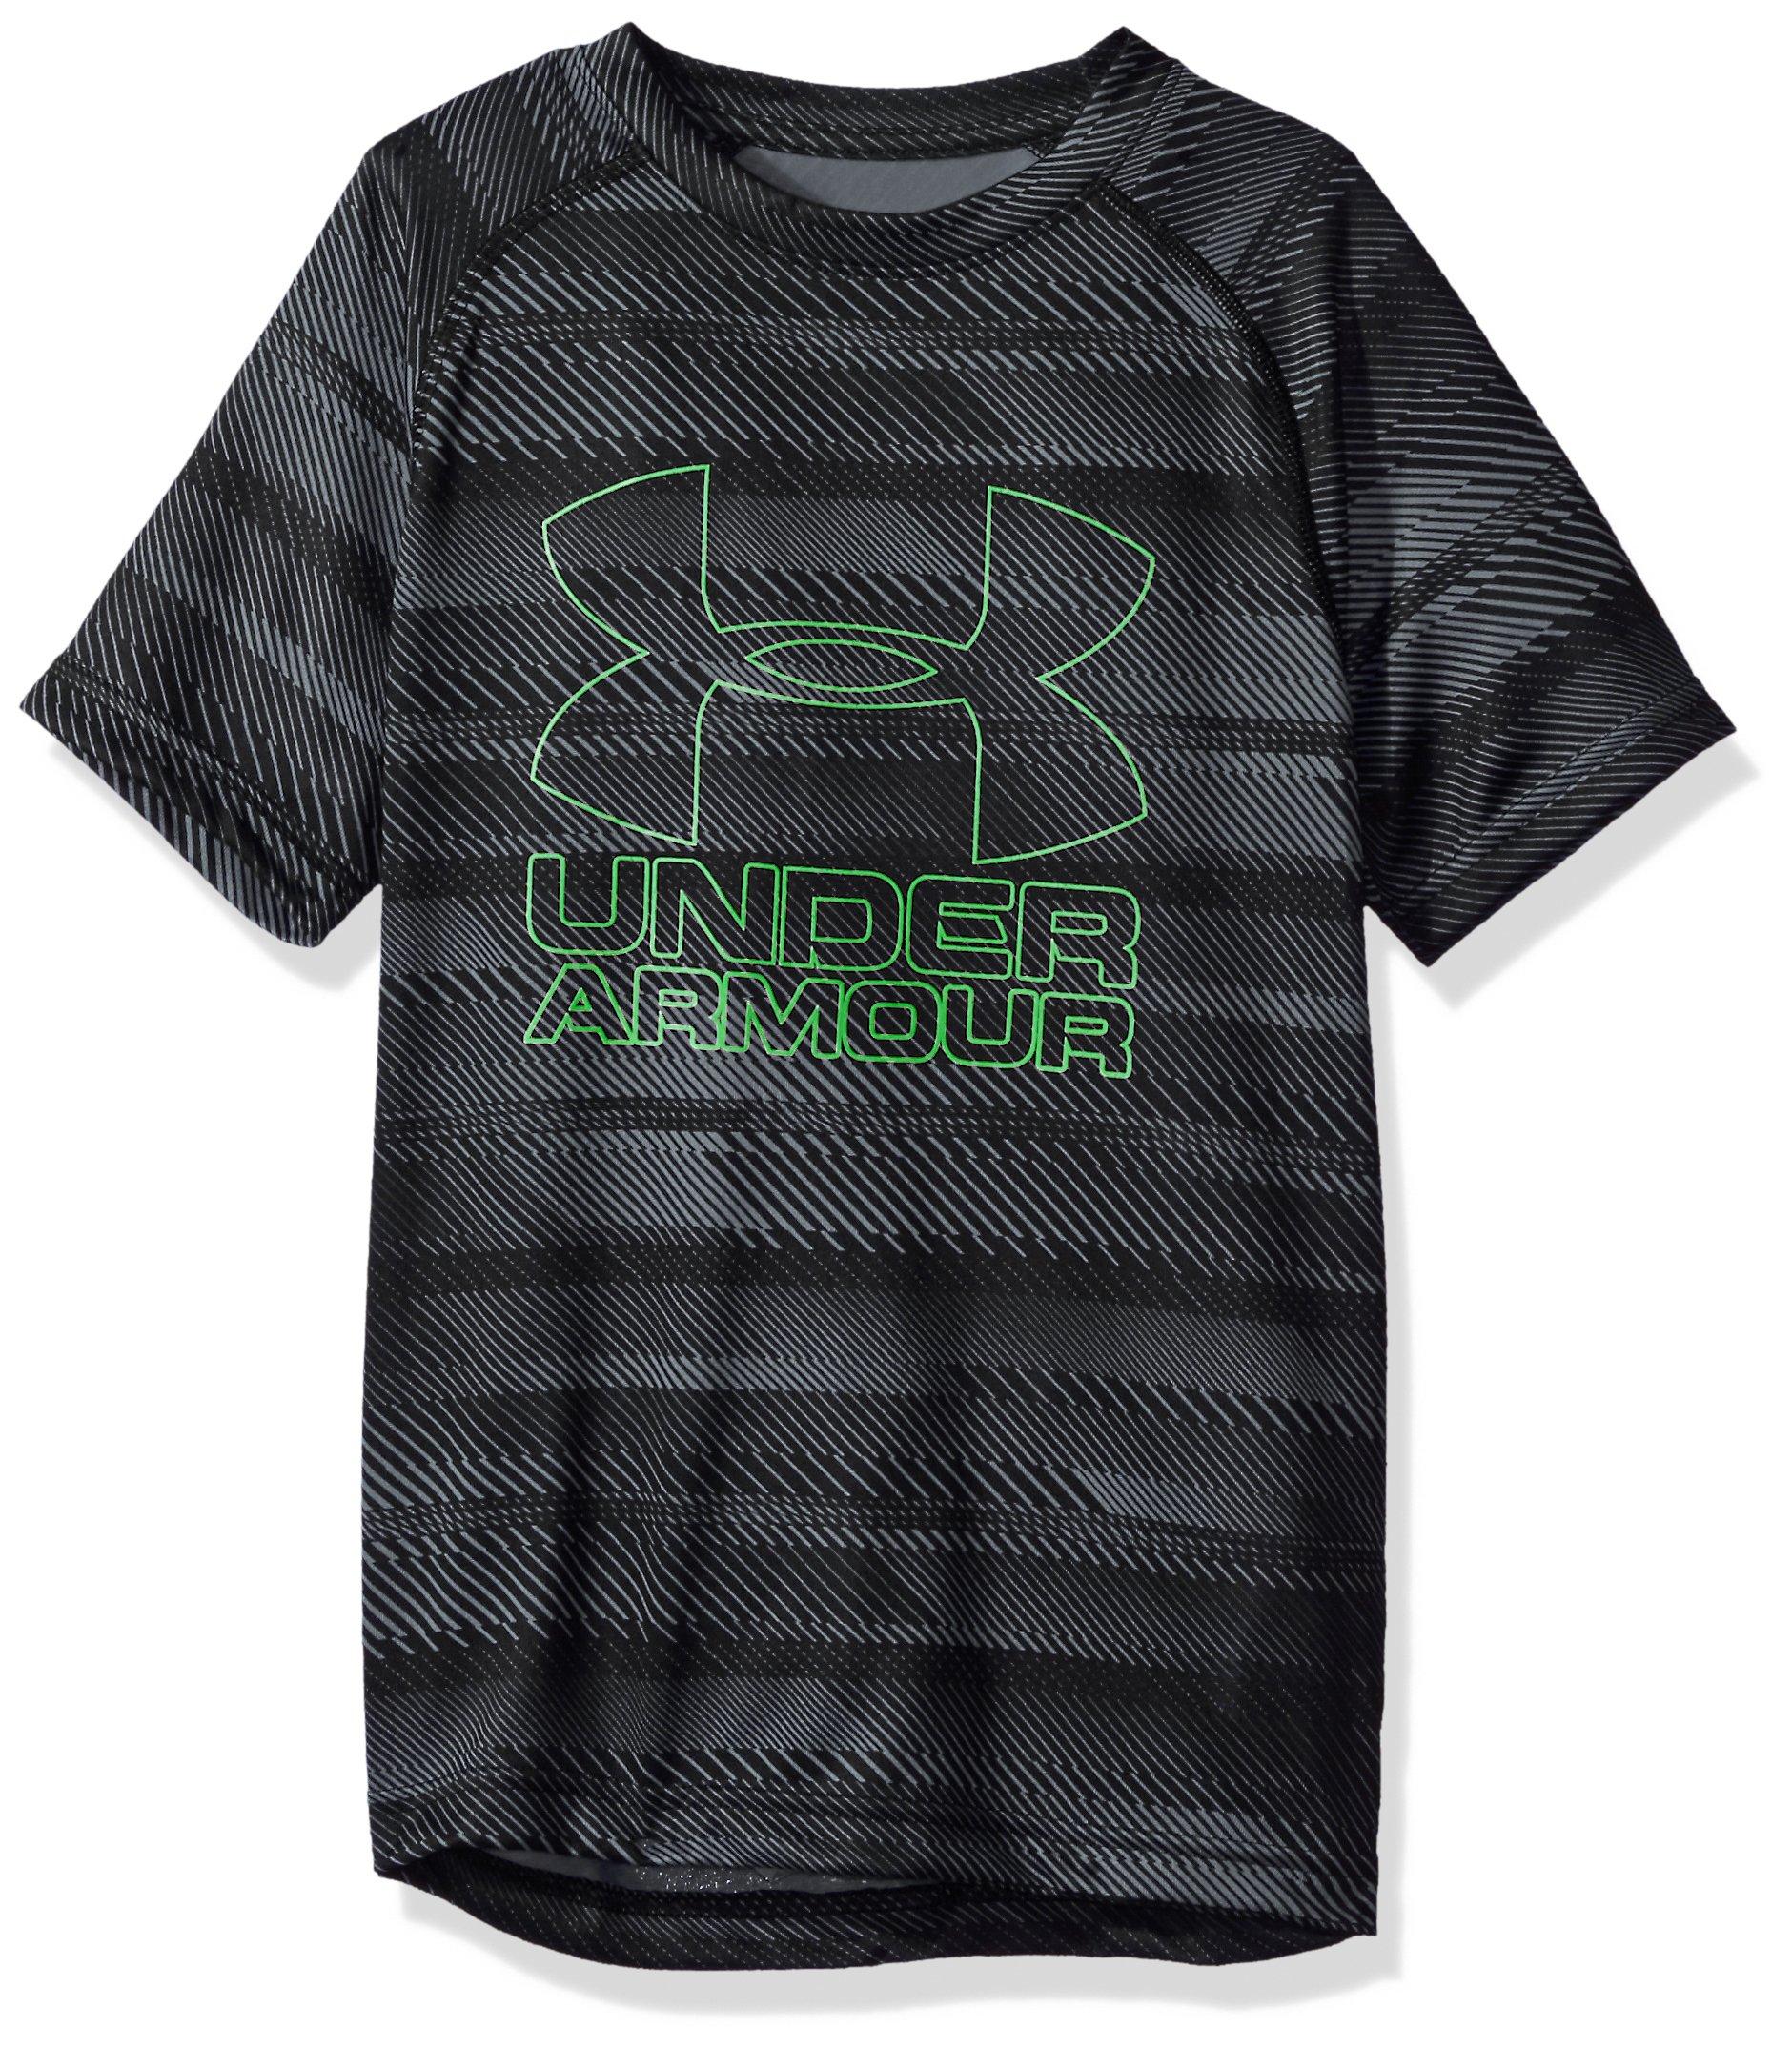 Under Armour Boys Big Logo Printed T-Shirt,Black /Lime Twist, Youth X-Small